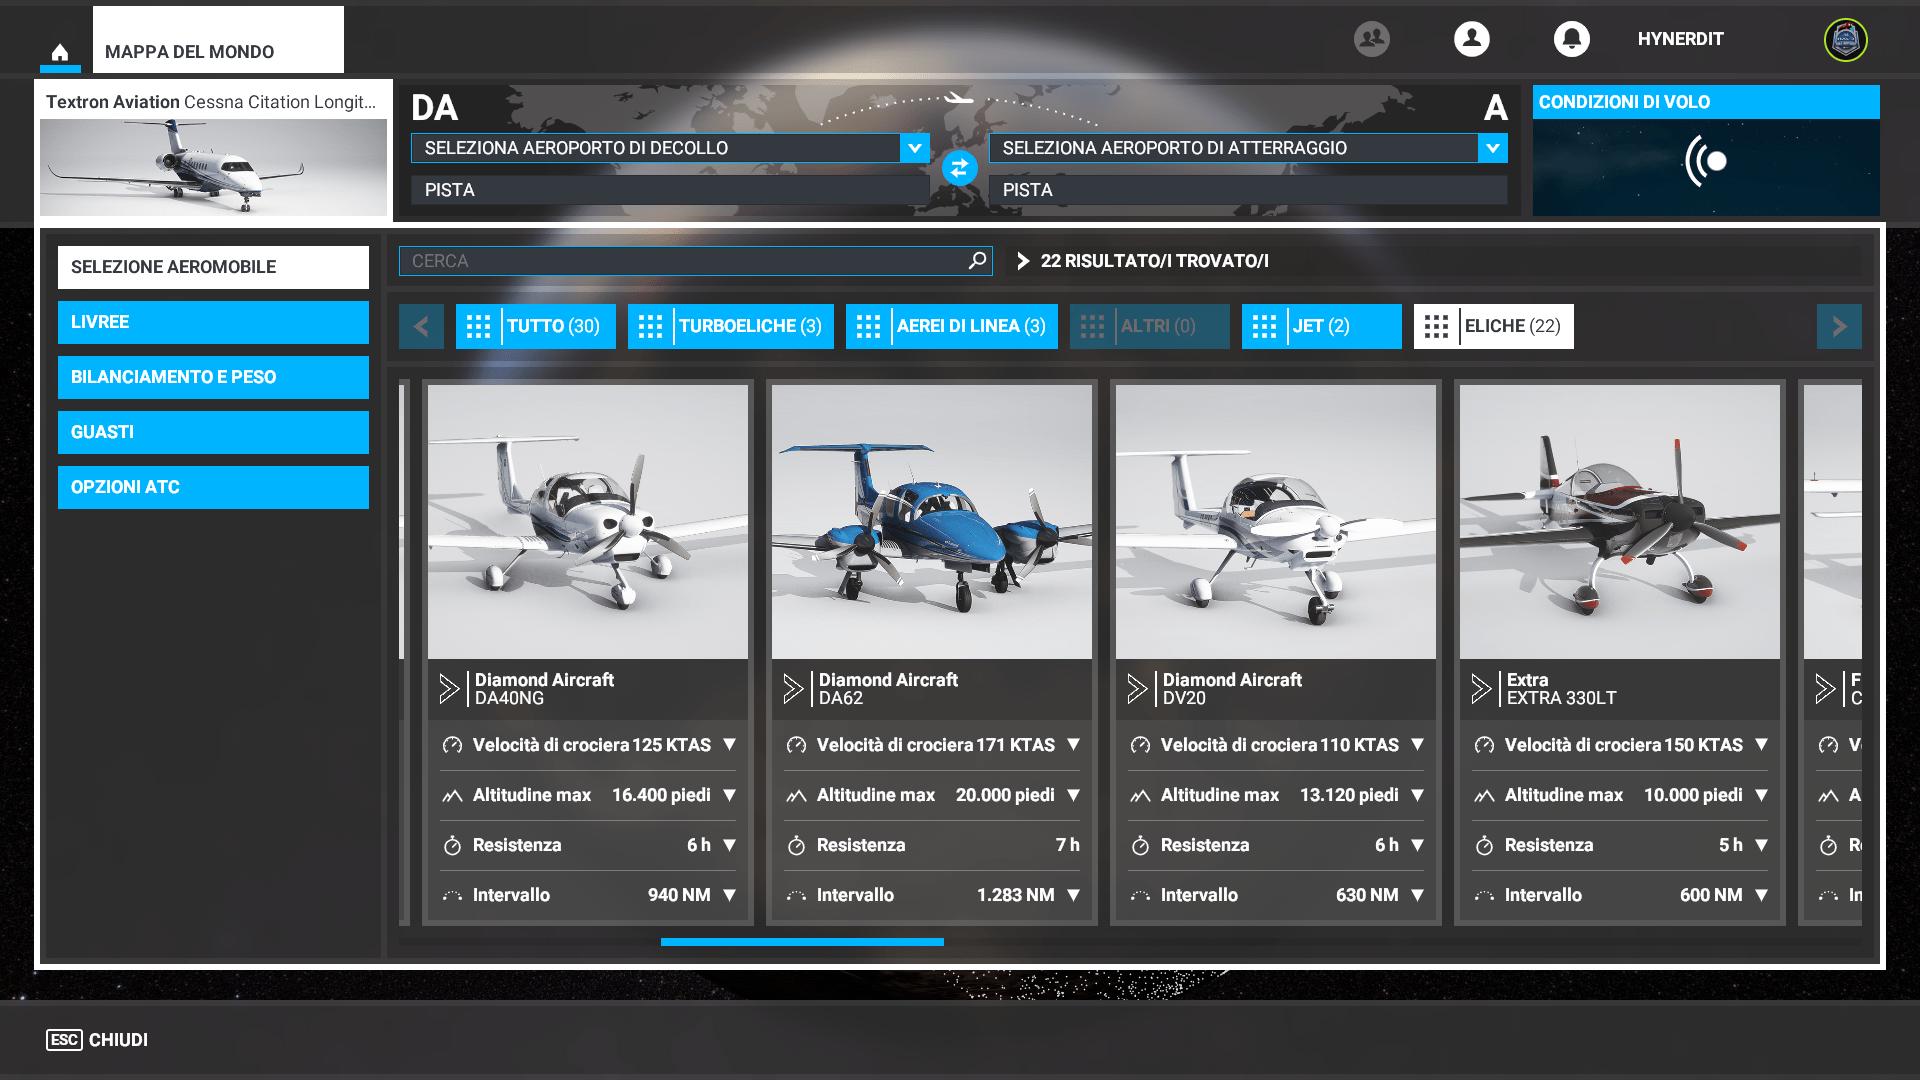 Microsoft Flight Simulator 2020: La Recensione 10 - Hynerd.it